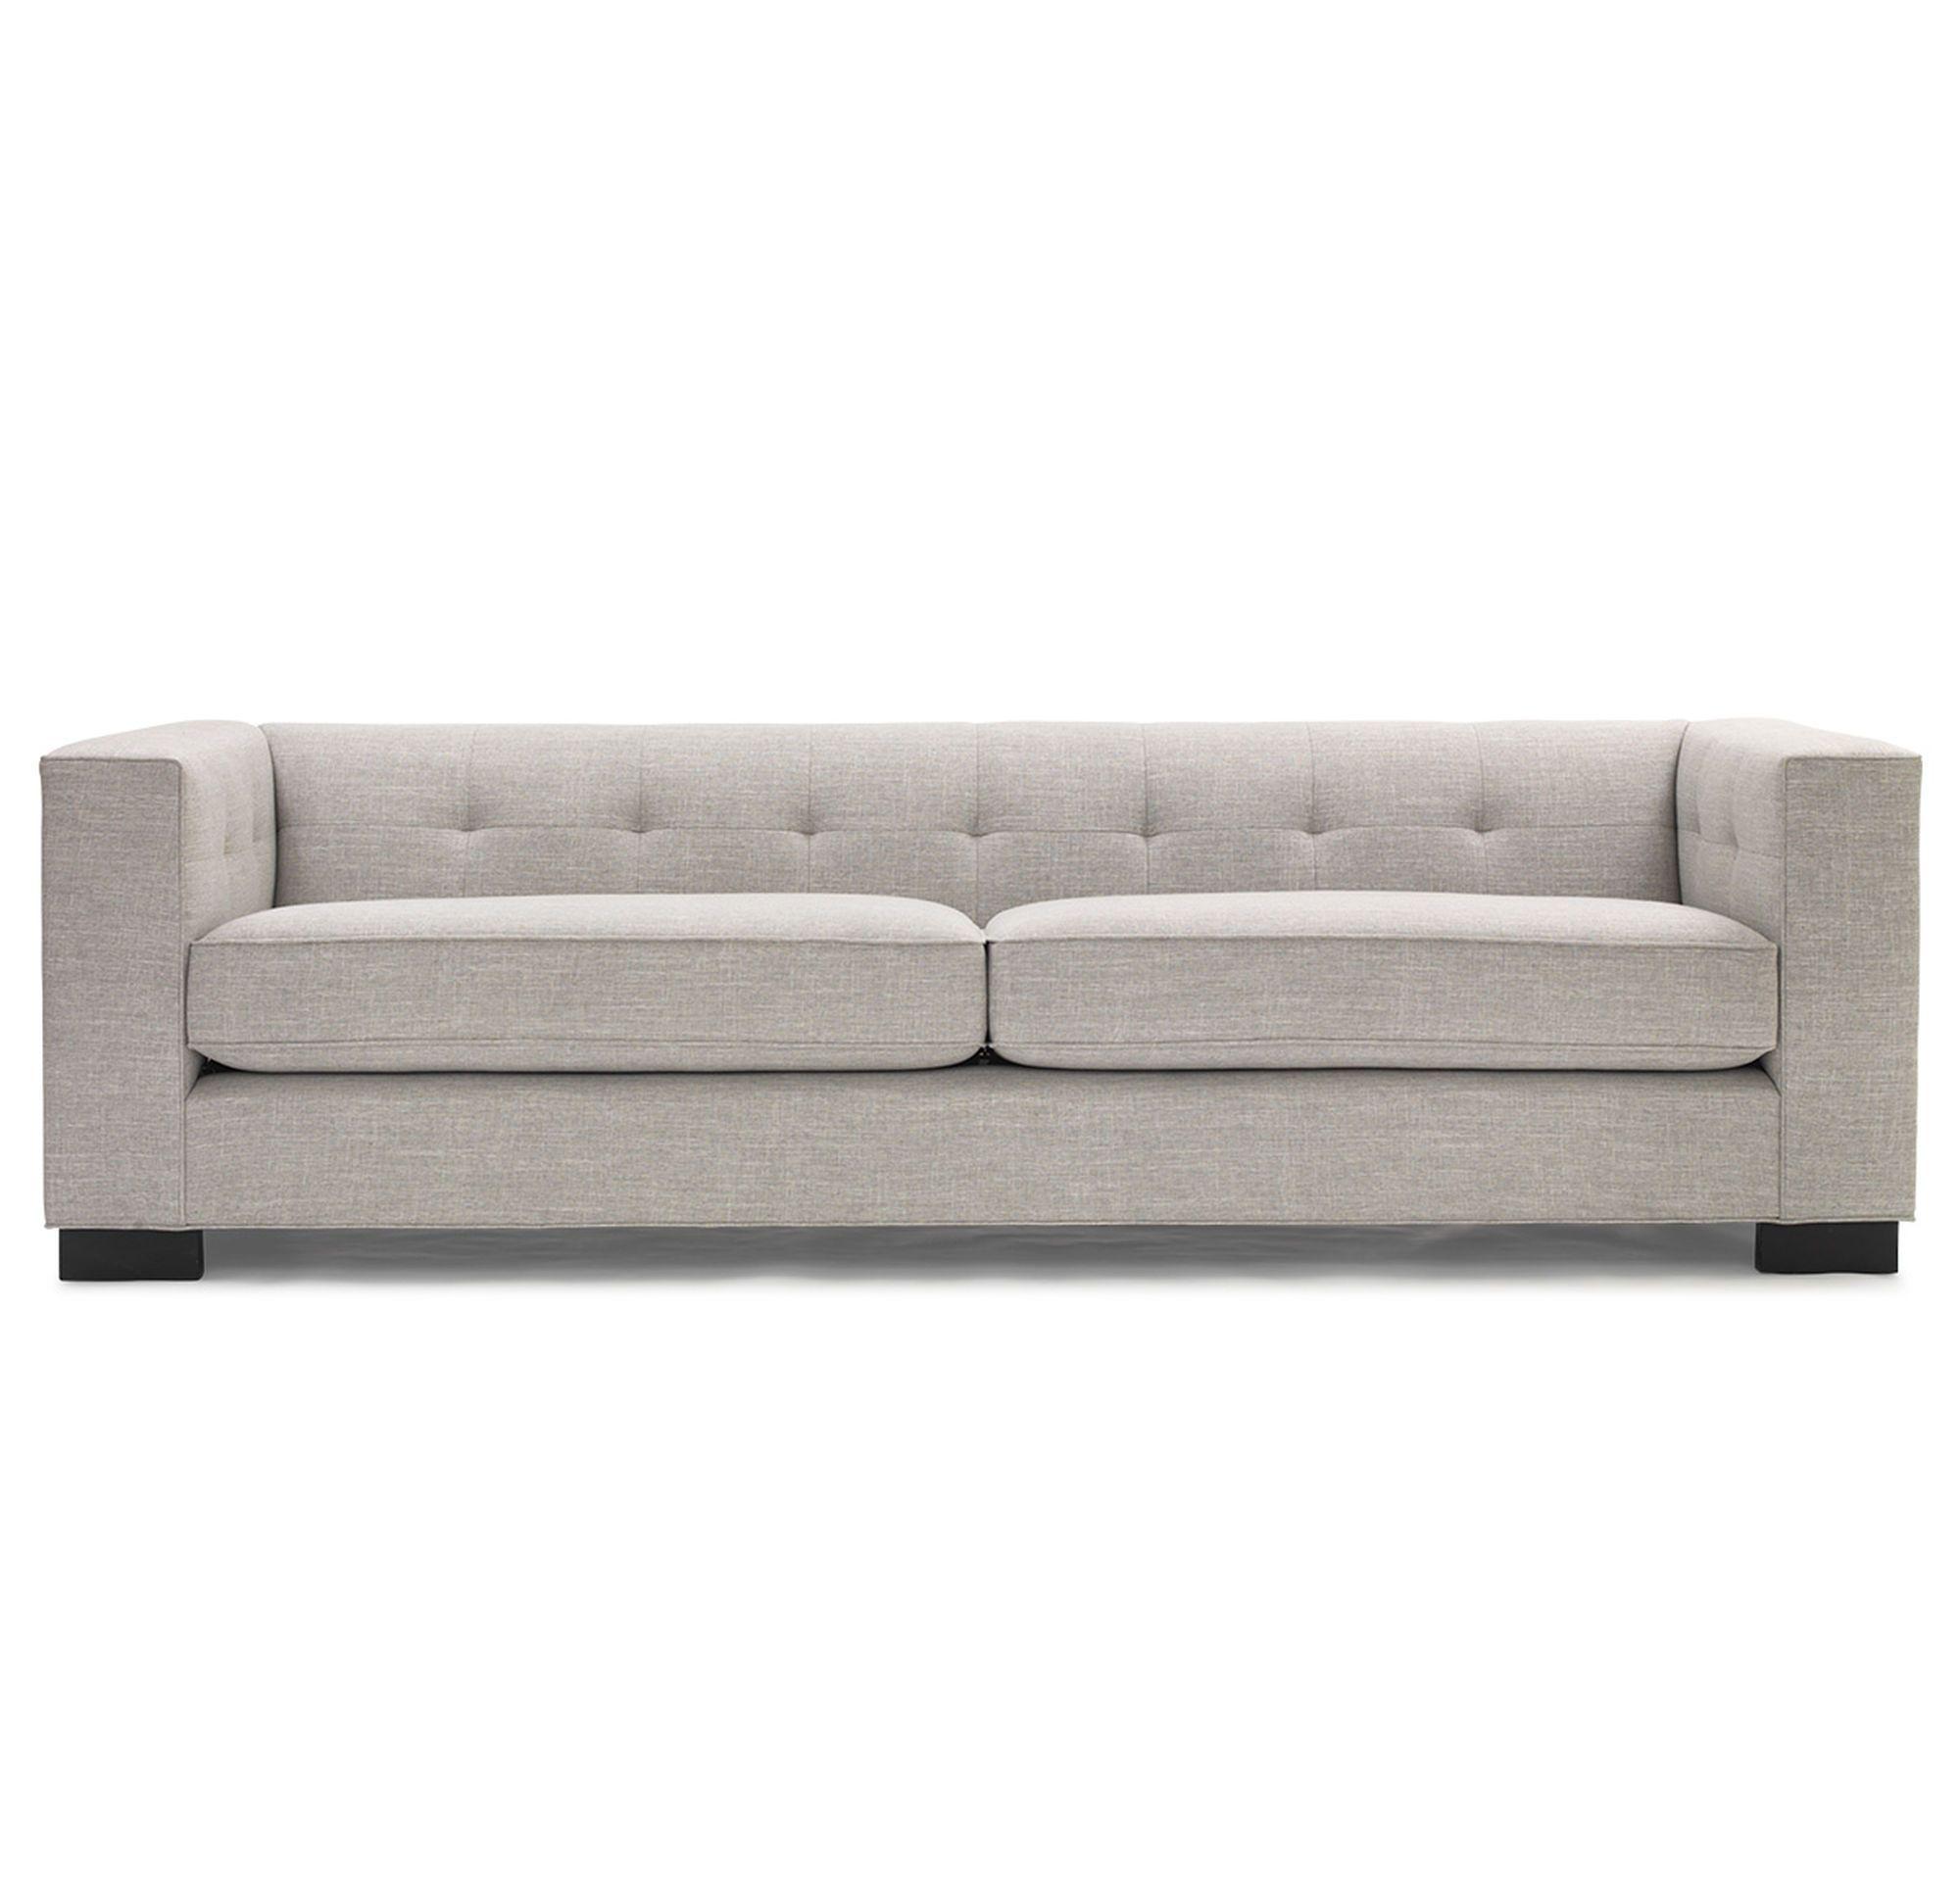 Bronson sofa nuance dove hi res